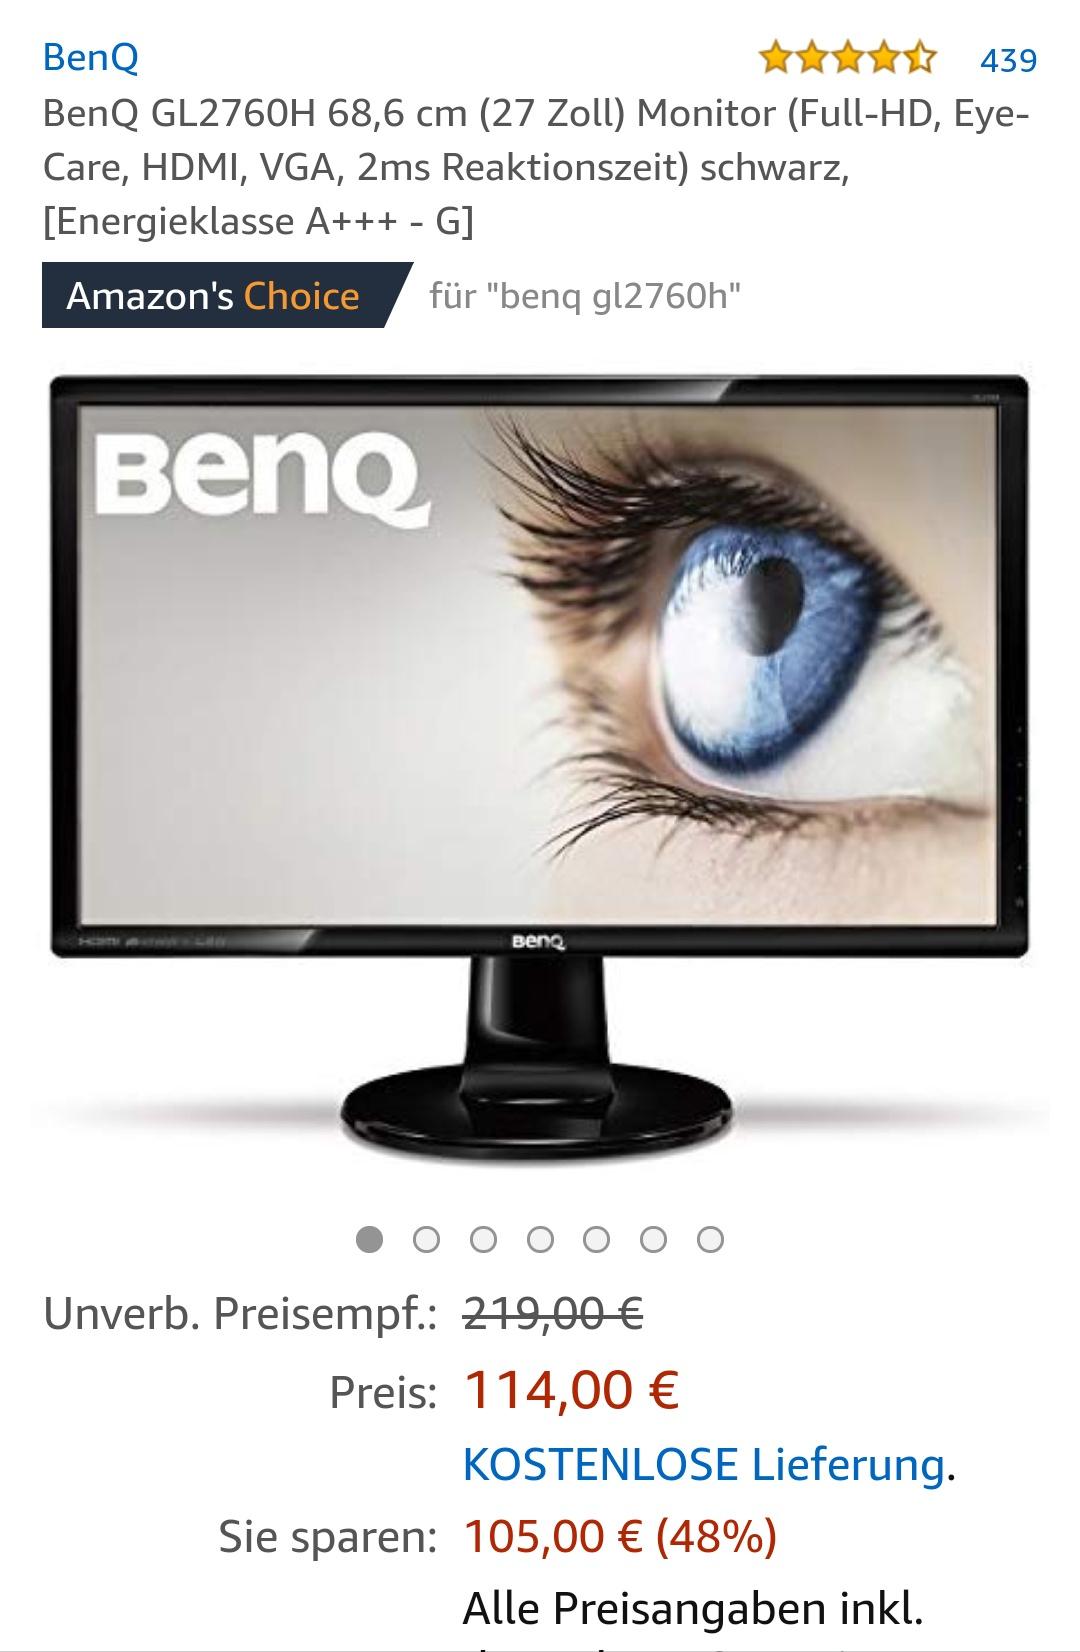 BenQ GL2760H 68,6 cm (27 Zoll) Monitor